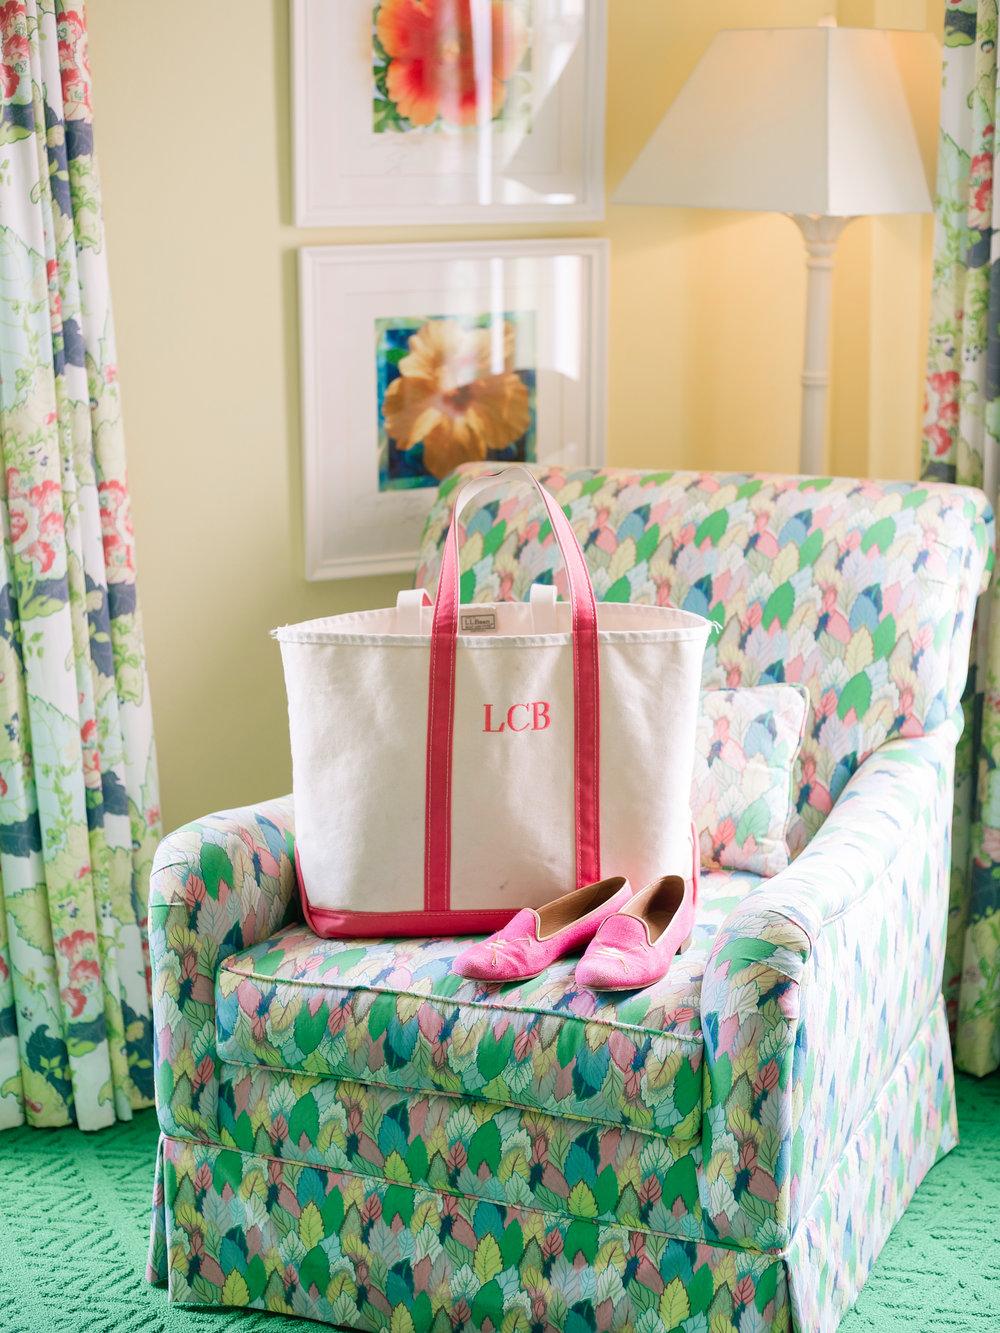 LCB STYLE FASHION BLOGGER COLONY HOTEL PALM BEACH-34.jpg